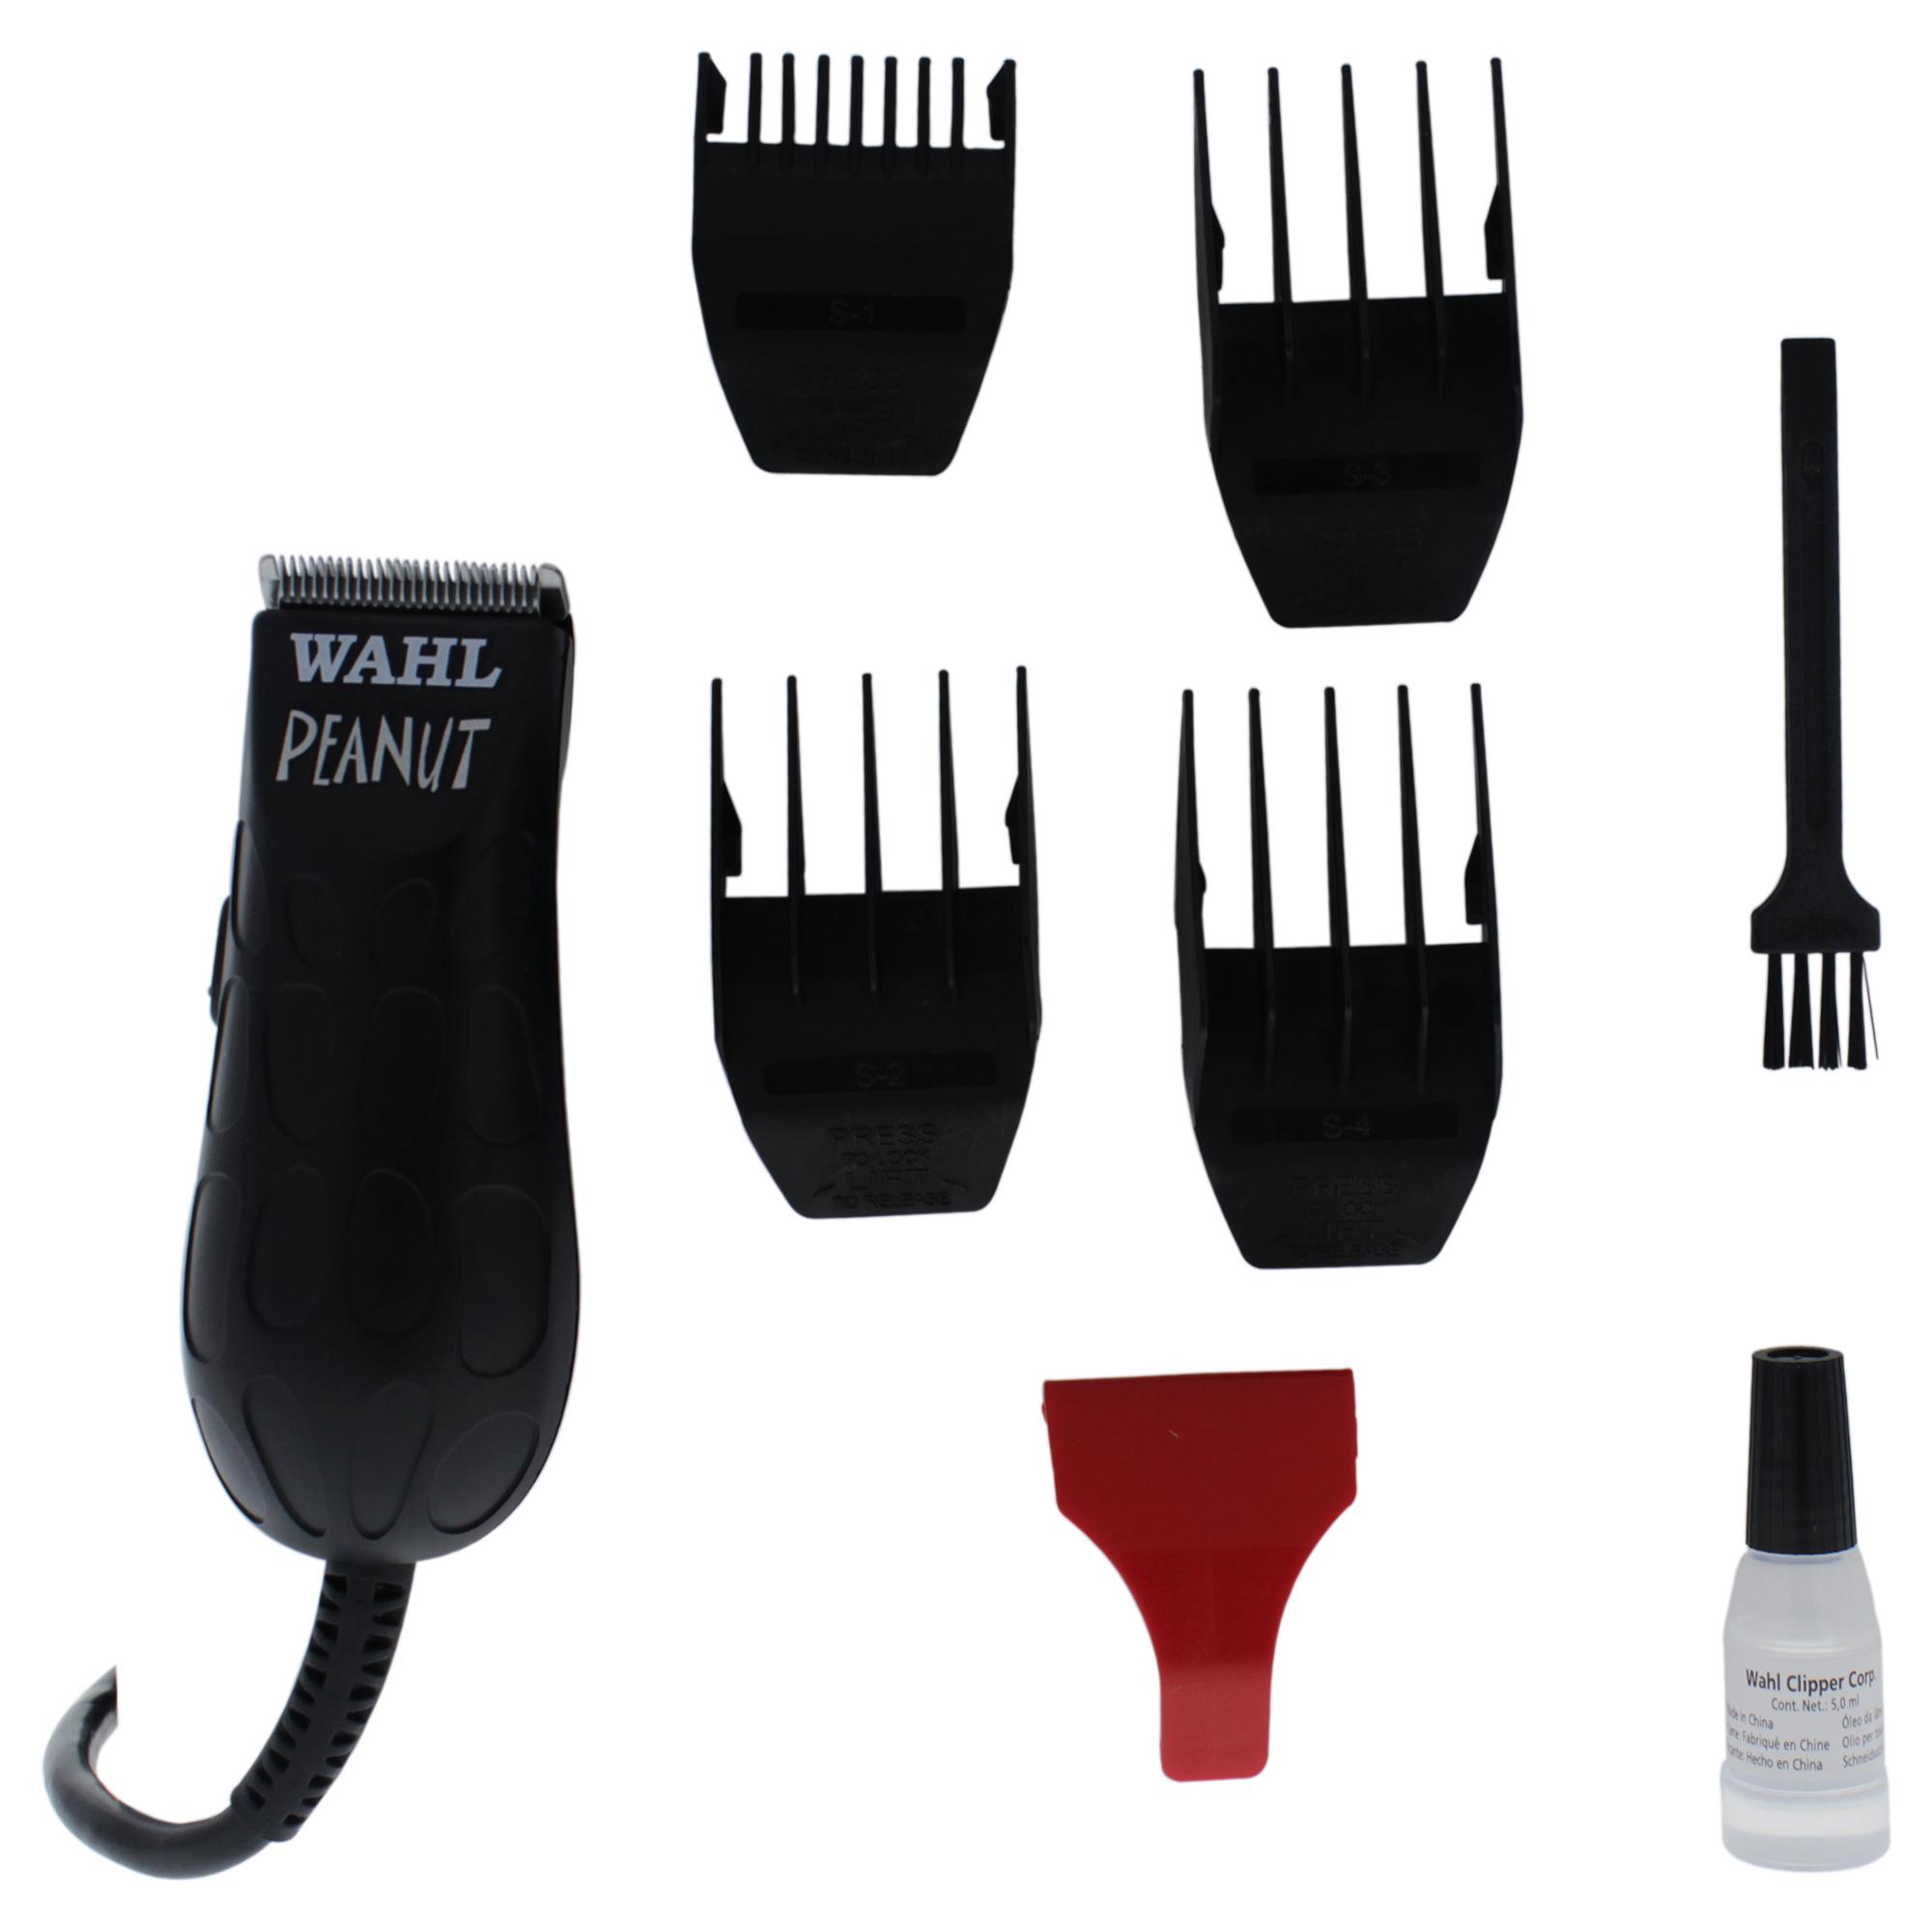 WAHL Professional Peanut - Model # 8655-200 - Black - 1 Pc Kit Trimmer